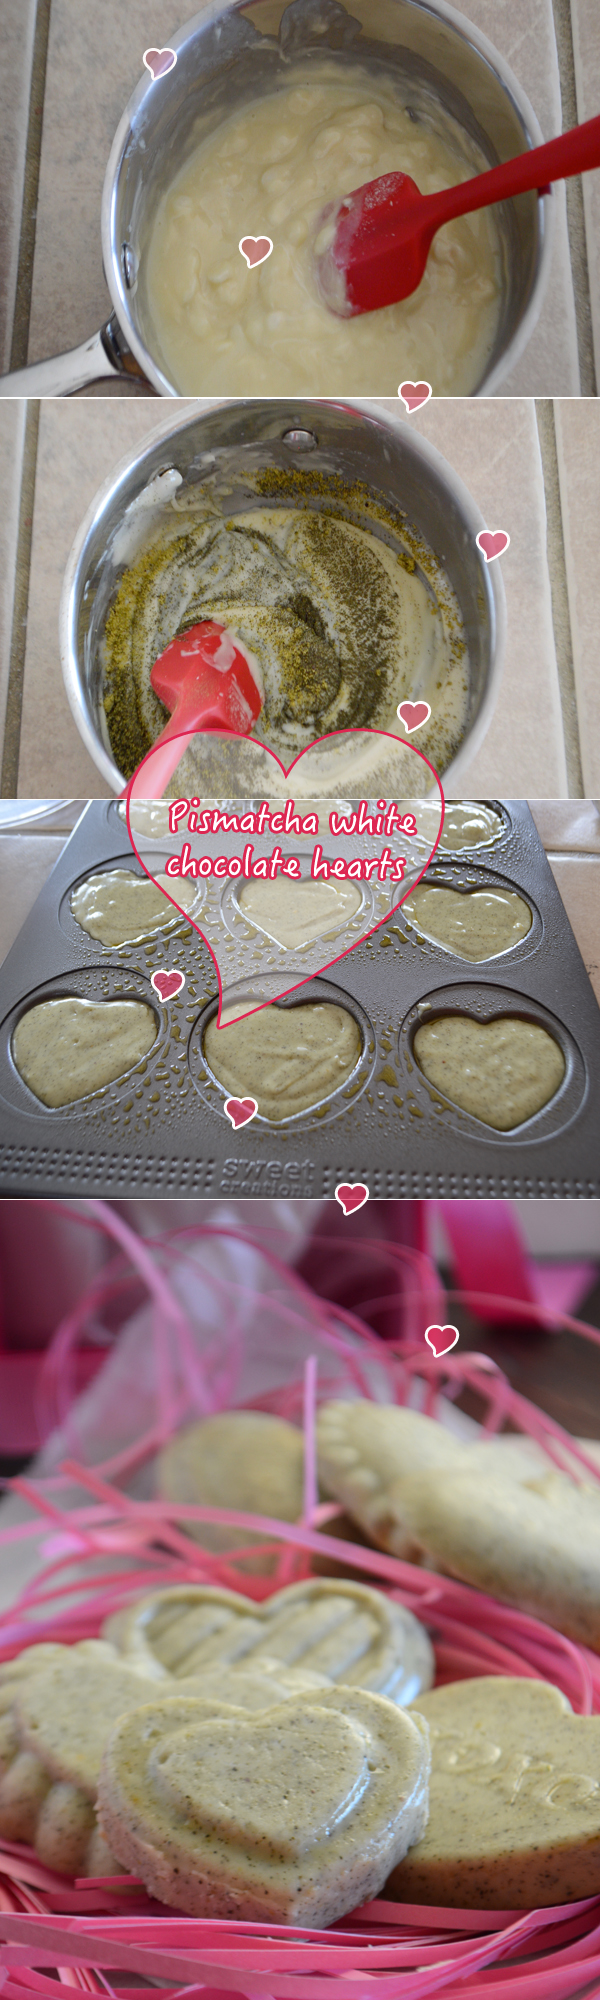 Easy valentine treats